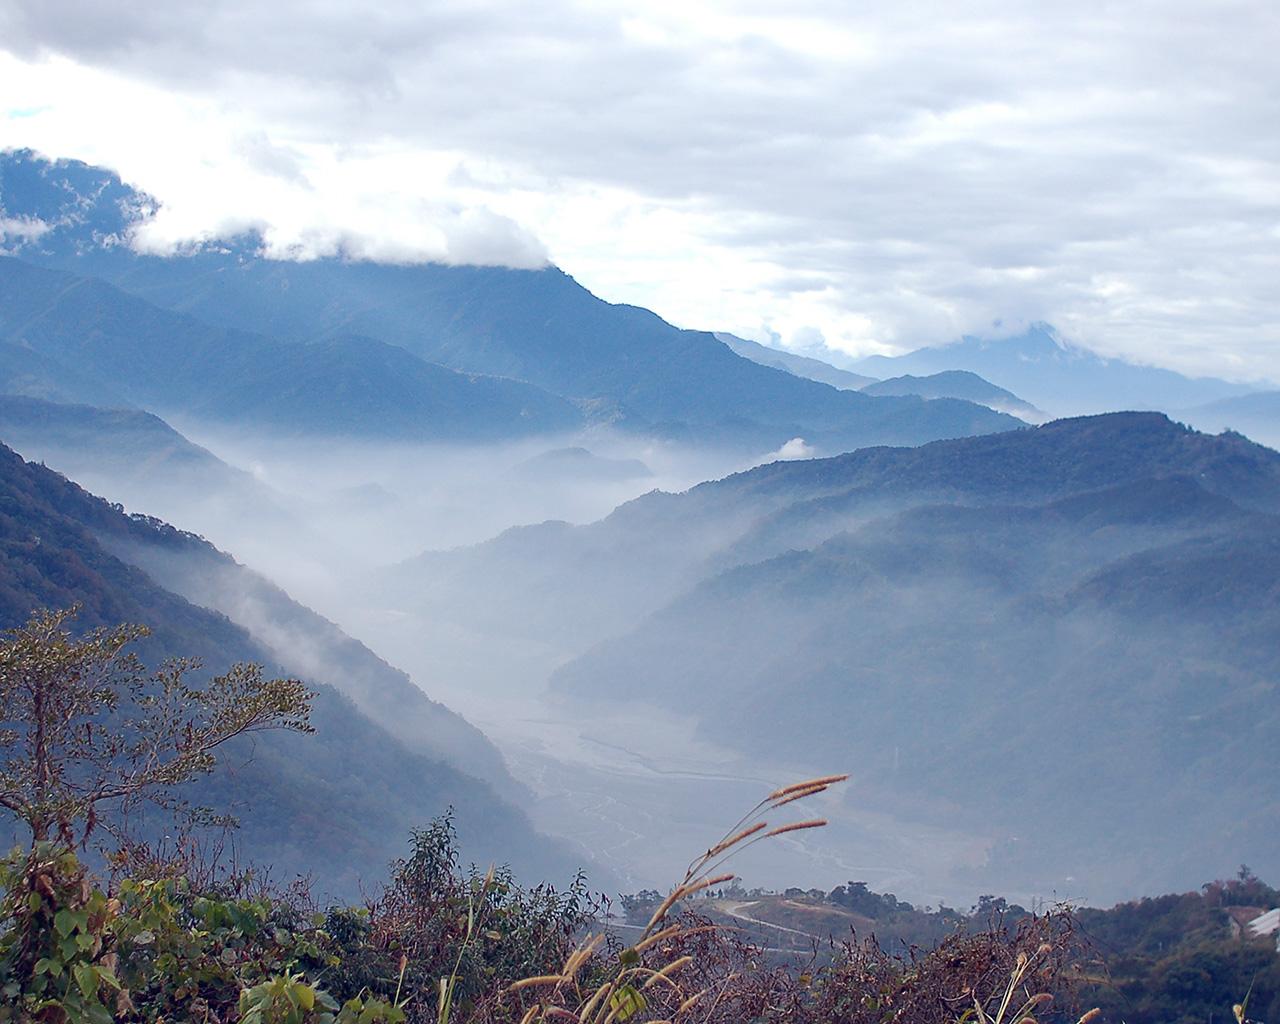 nr55-cloudy-mountain-nature-wallpaper